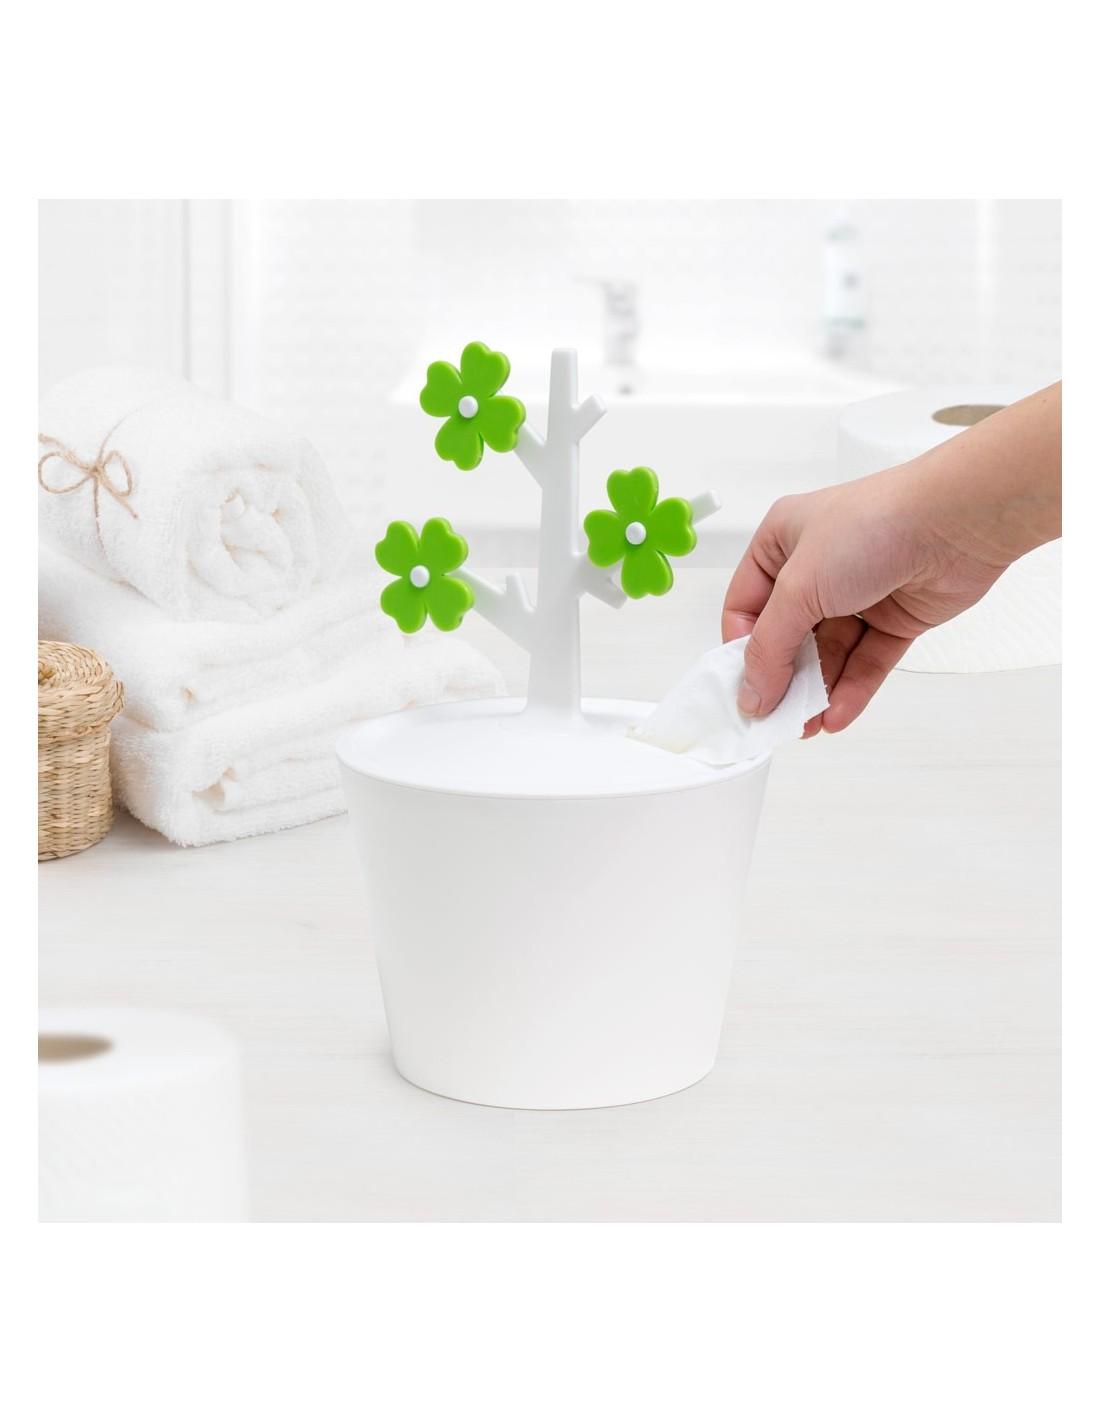 Porta Carta Igienica Originali porta carta igienica a forma di vaso di fiori - think green